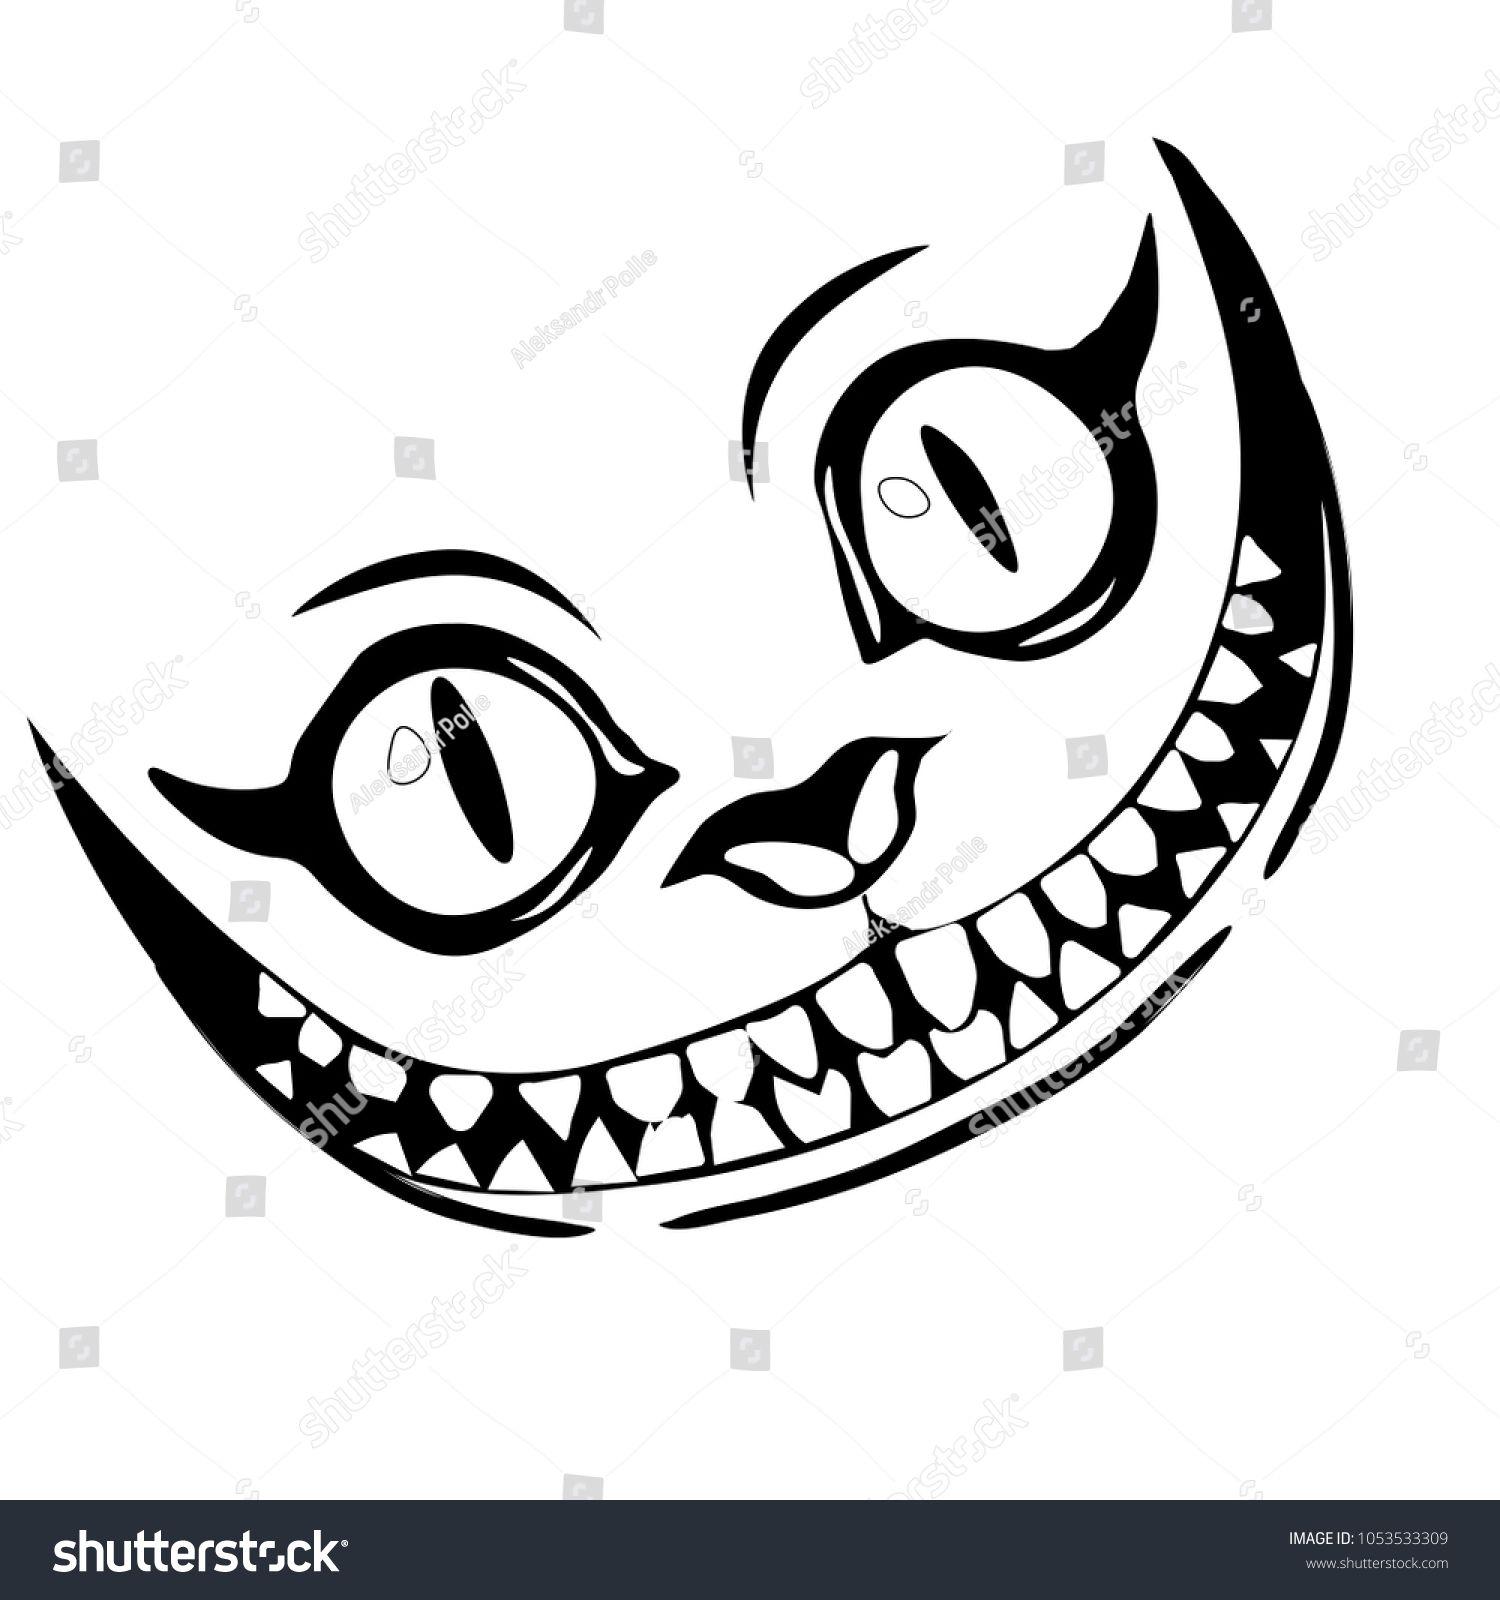 Grin Like A Cheshire Cat Cheshire Cat Tattoo Cheshire Cat Drawing Cheshire Cat Art